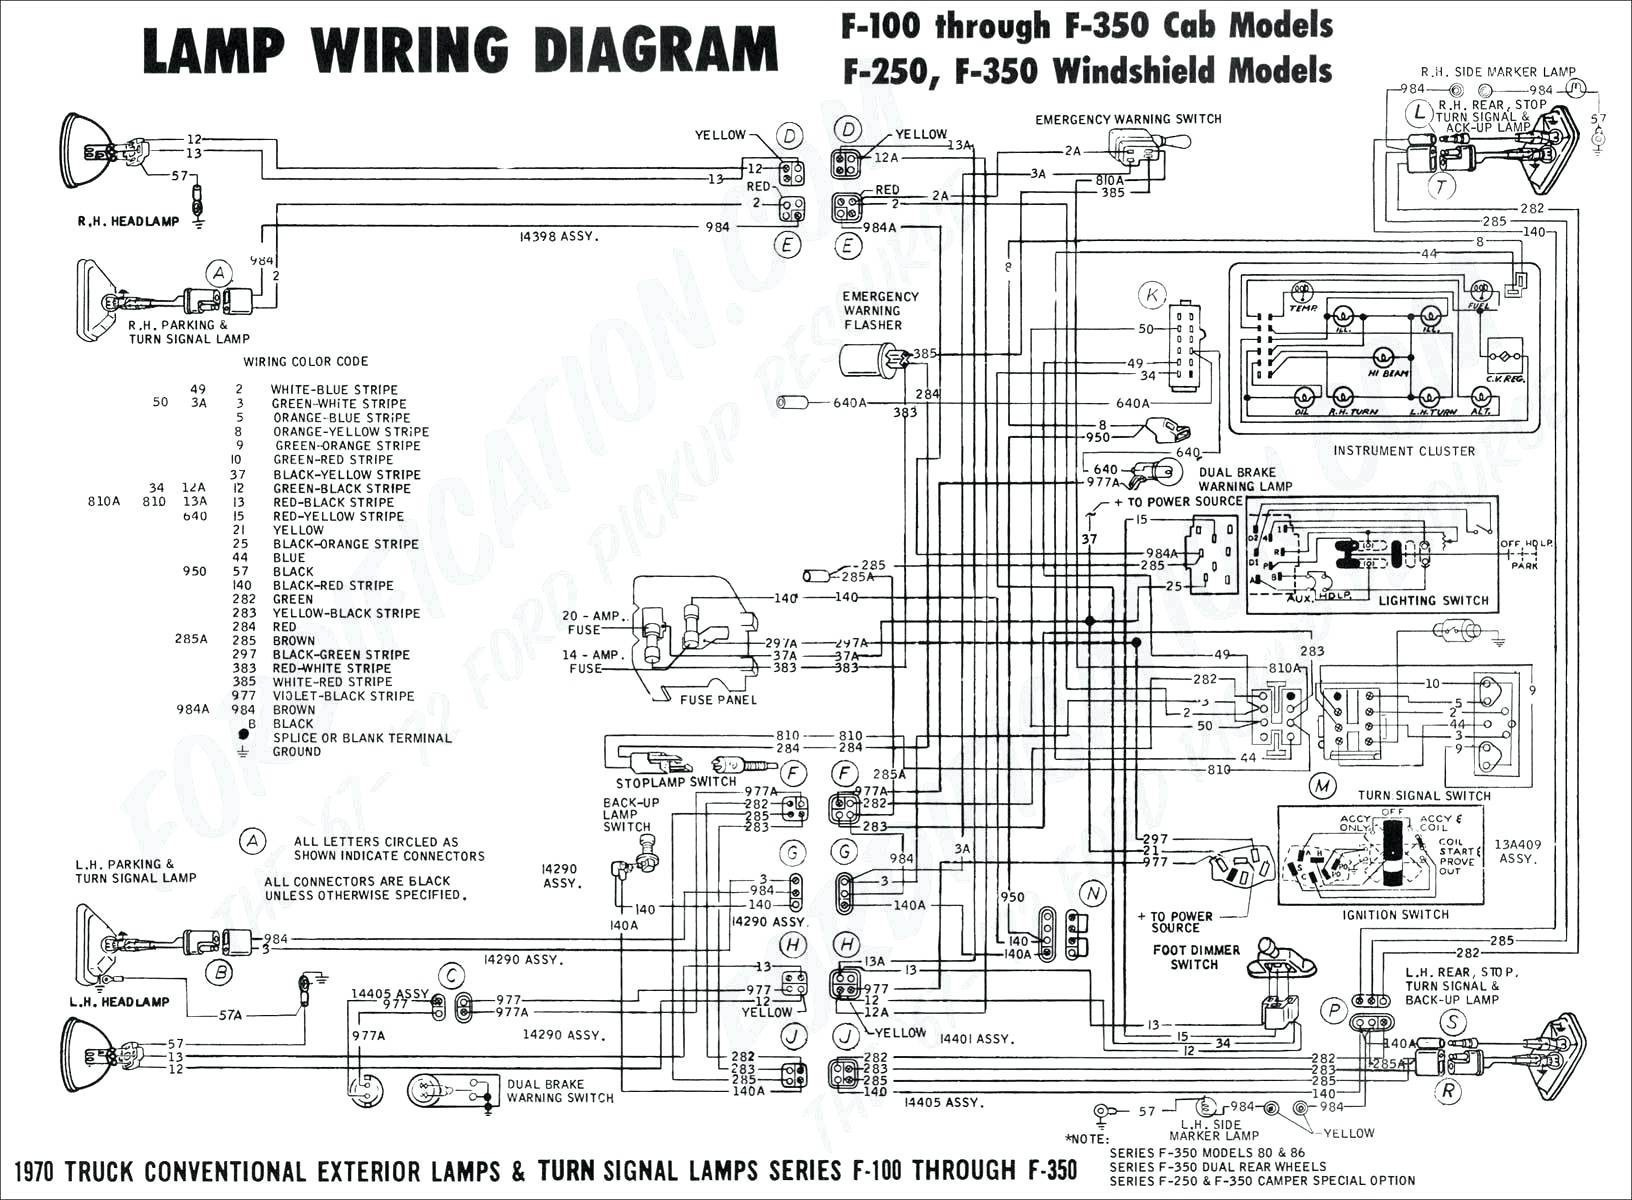 Toyota Truck Parts Diagram toyota Tail Light Wiring Diagram Free Picture Wiring Of Toyota Truck Parts Diagram